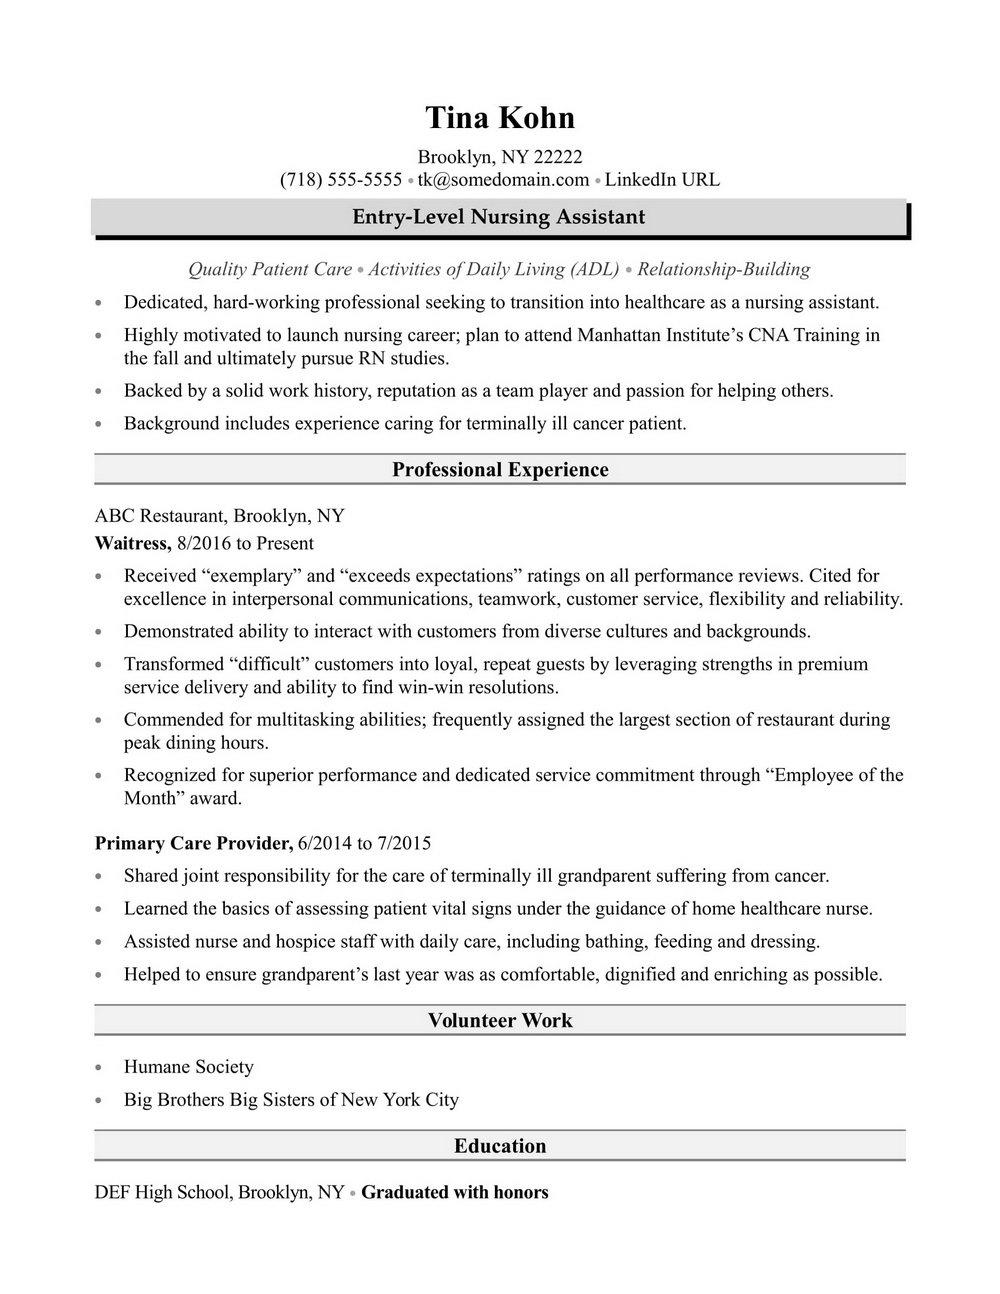 Sample Resume Summary For Nursing Assistant